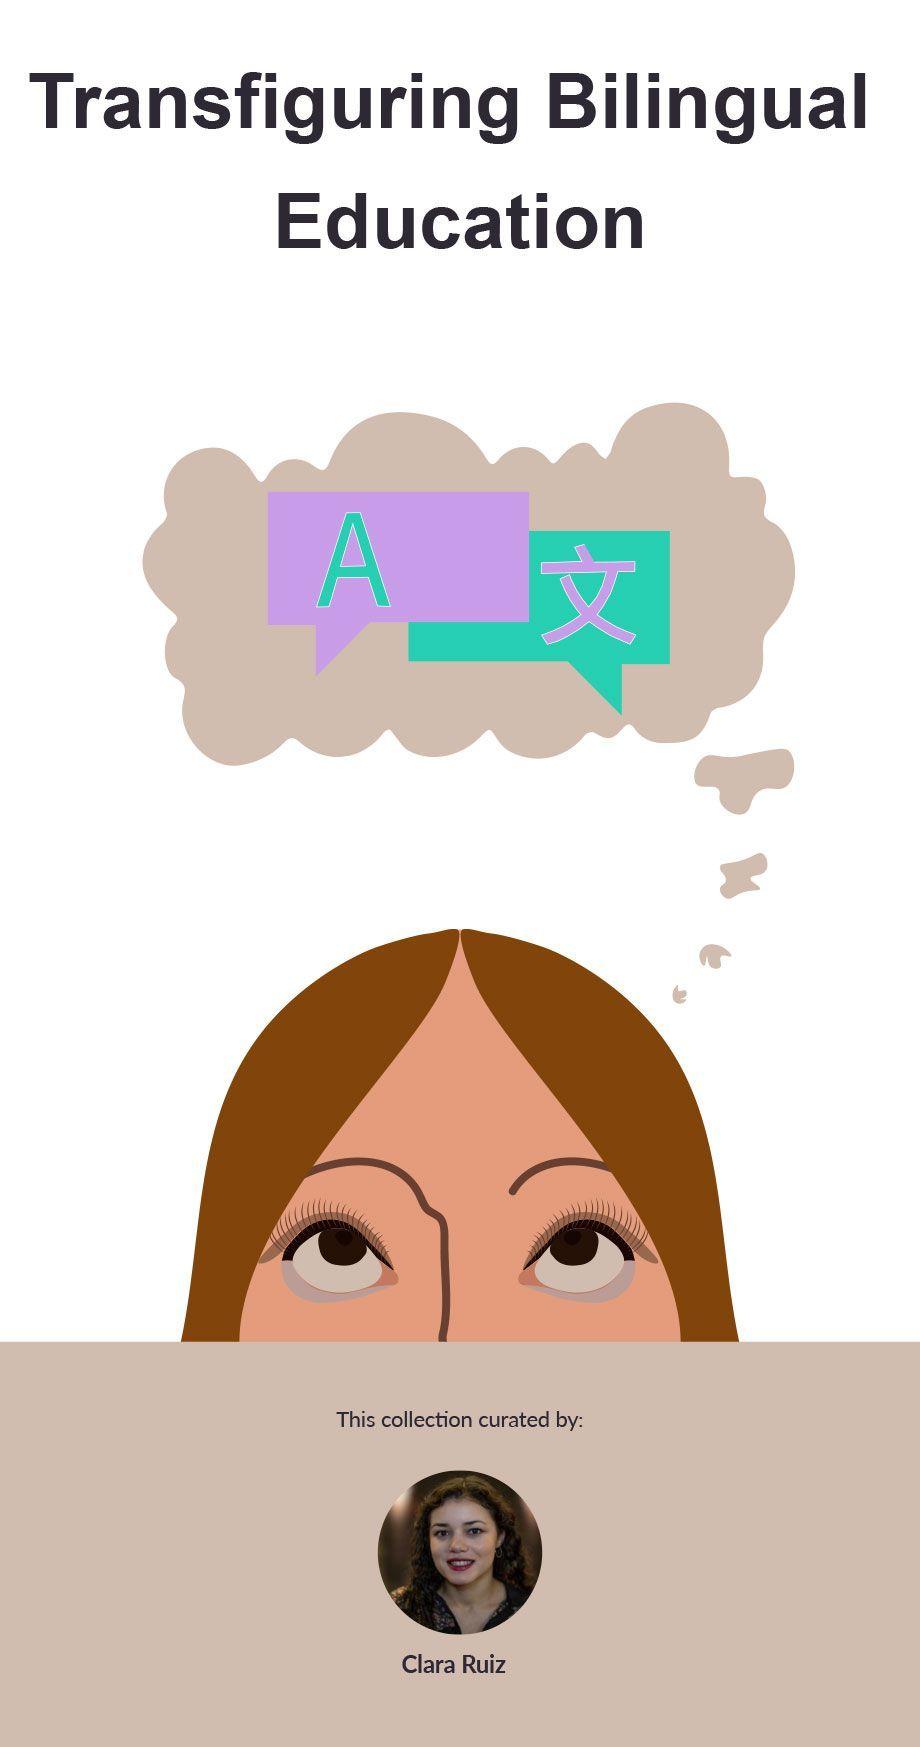 Transfiguring Bilingual Education